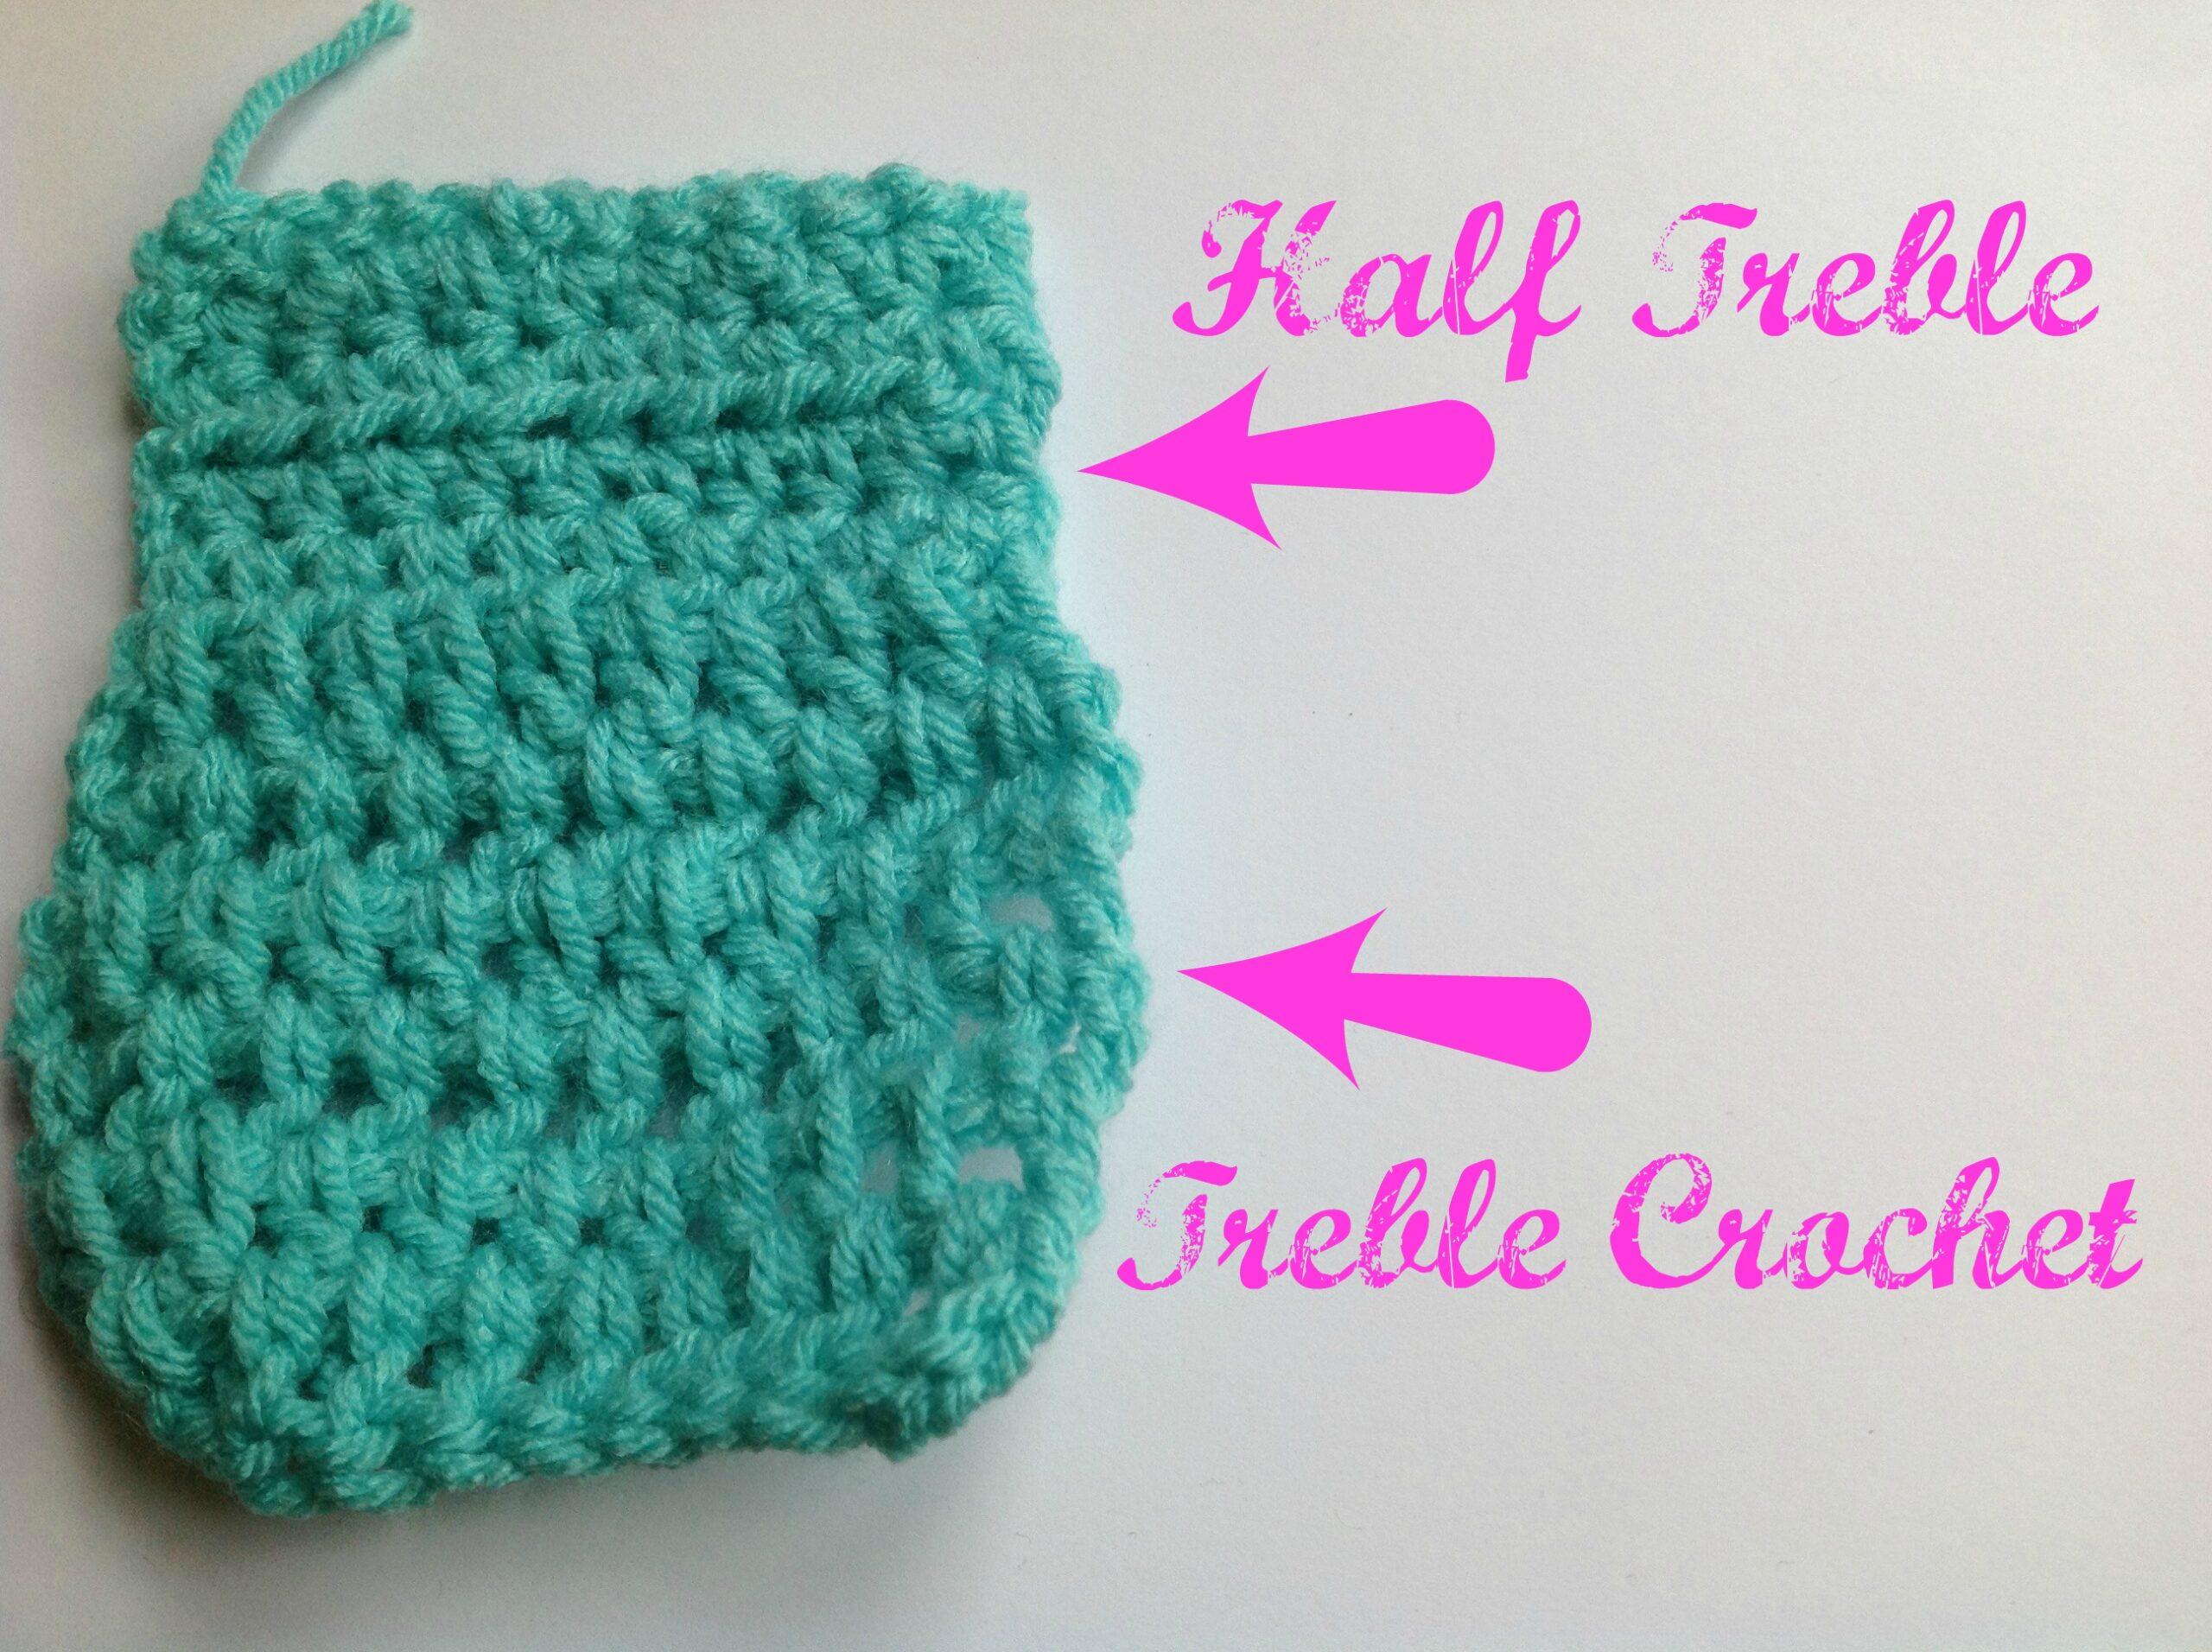 Half Treble Crochet Diagram Wiring Schema Img Stitches The Story So Far Crafts On Sea Foundation Double Stitch